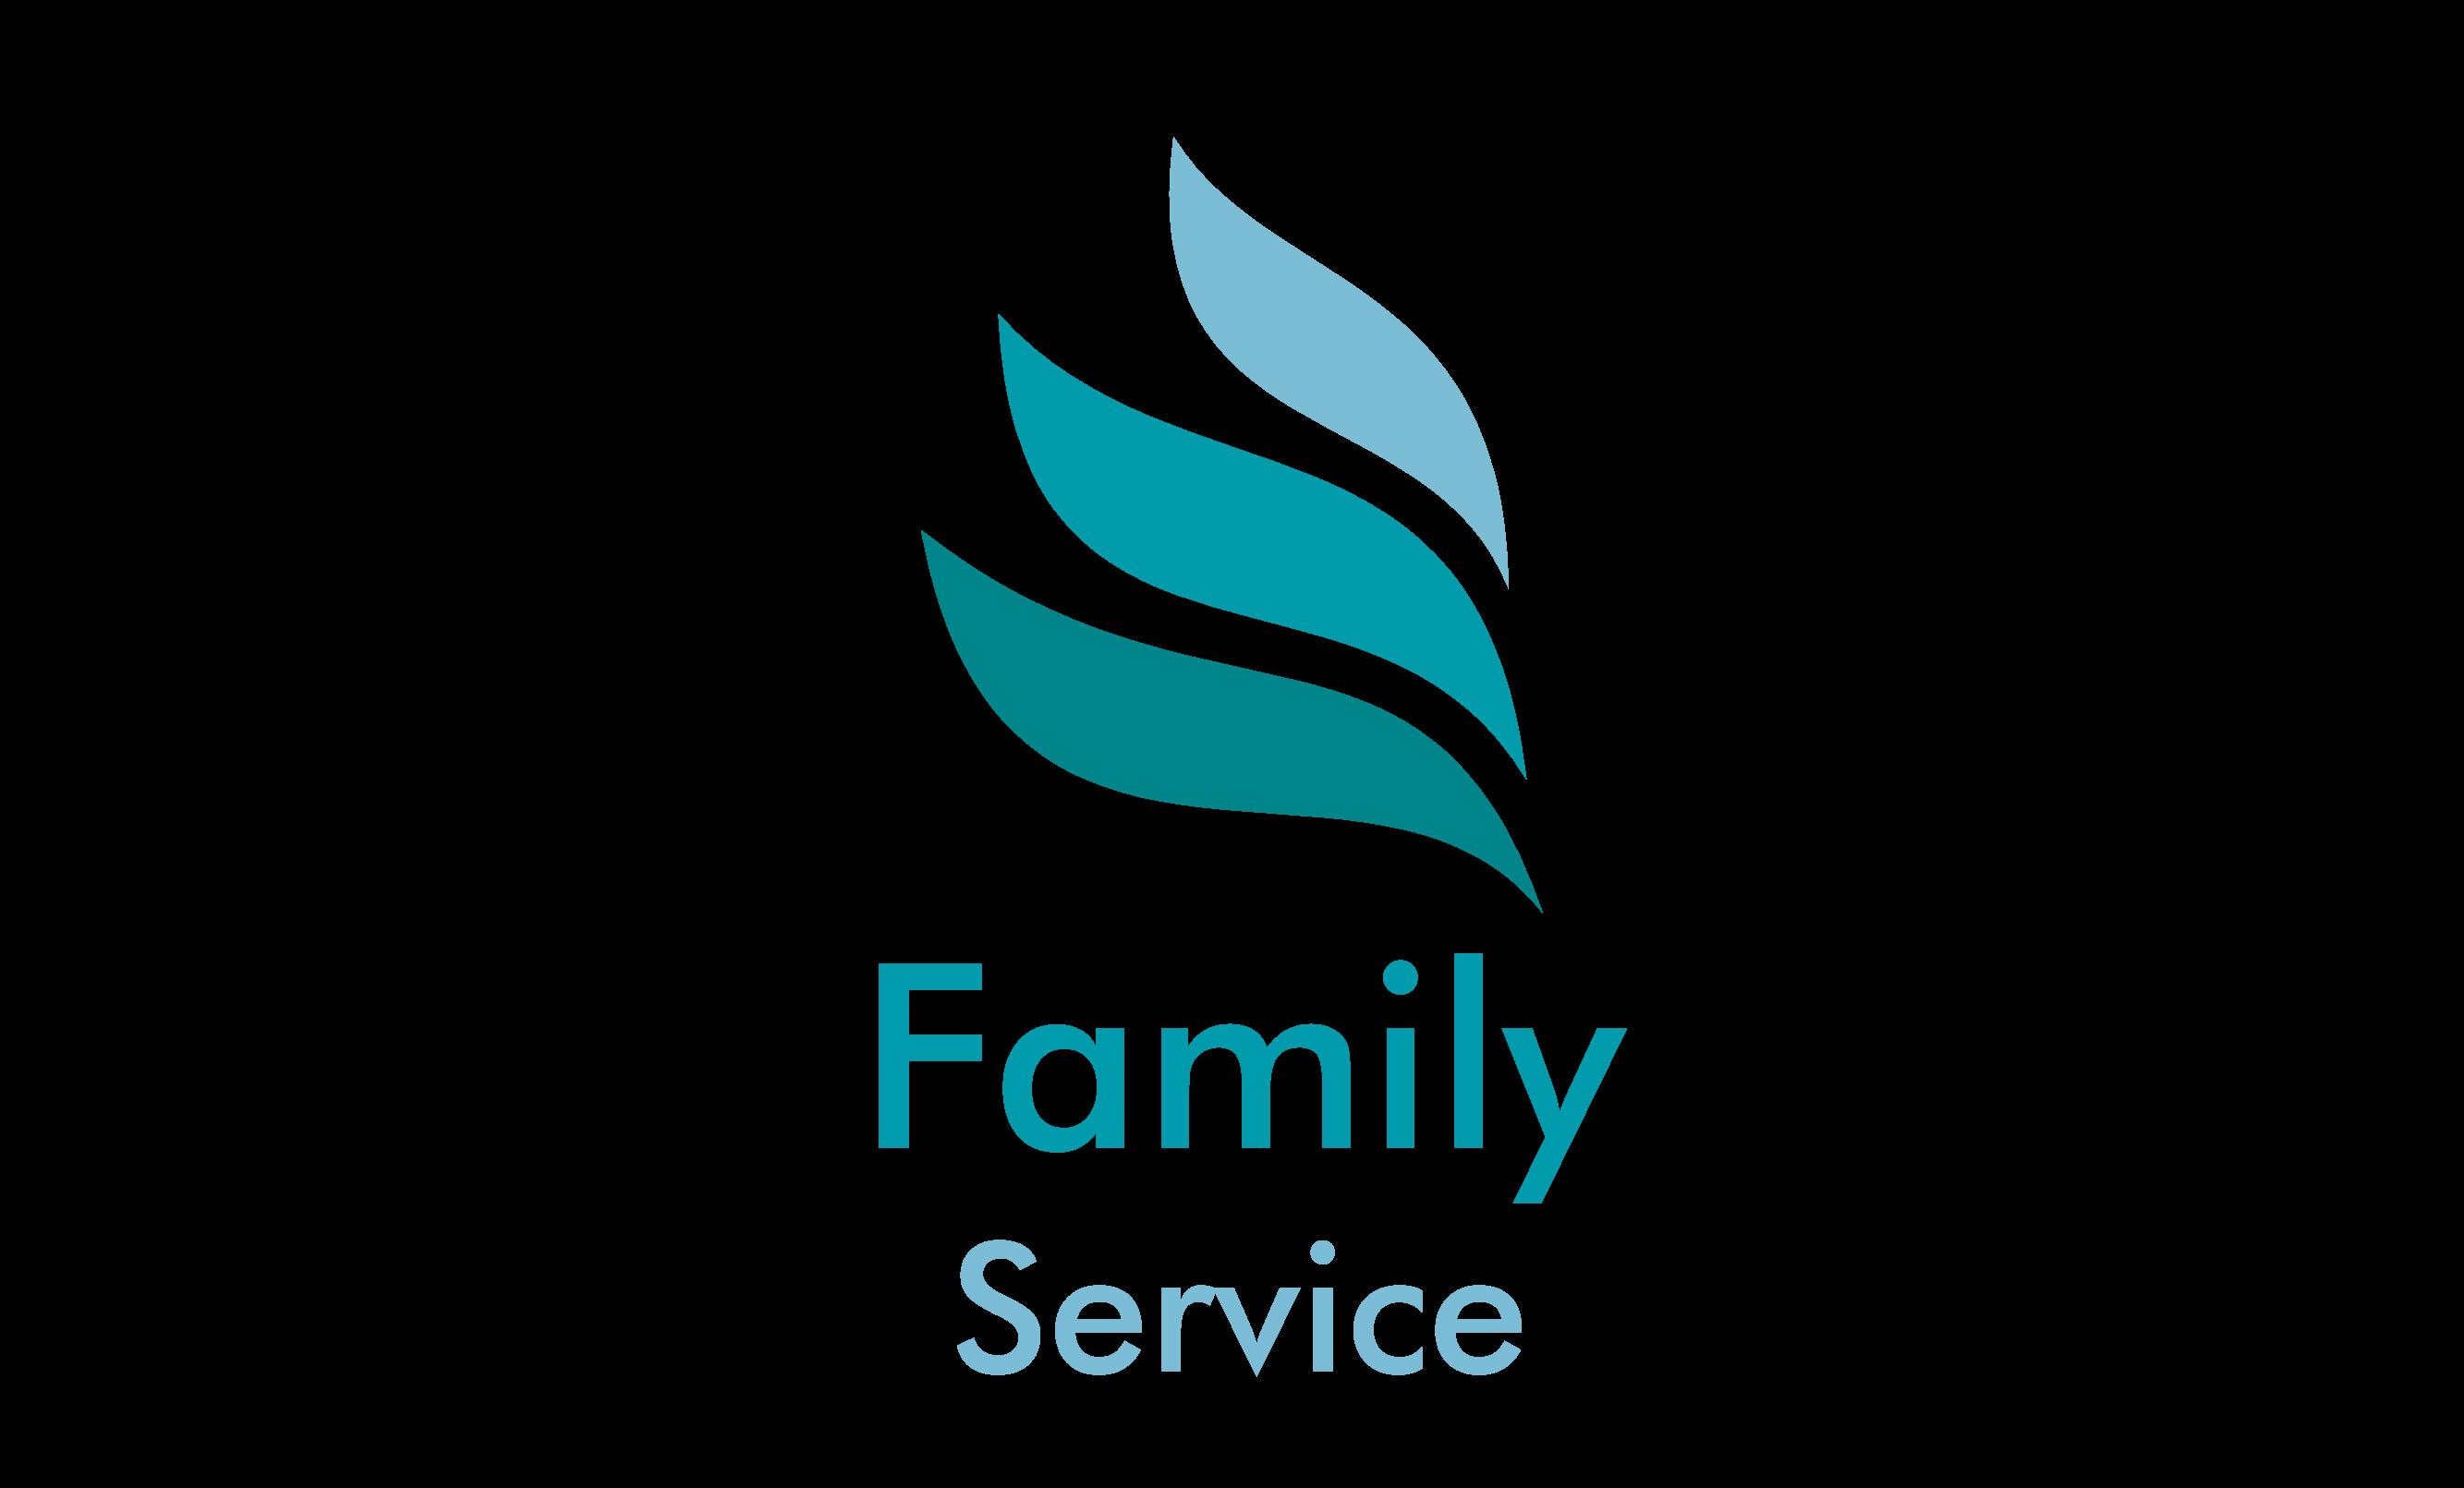 Family Service